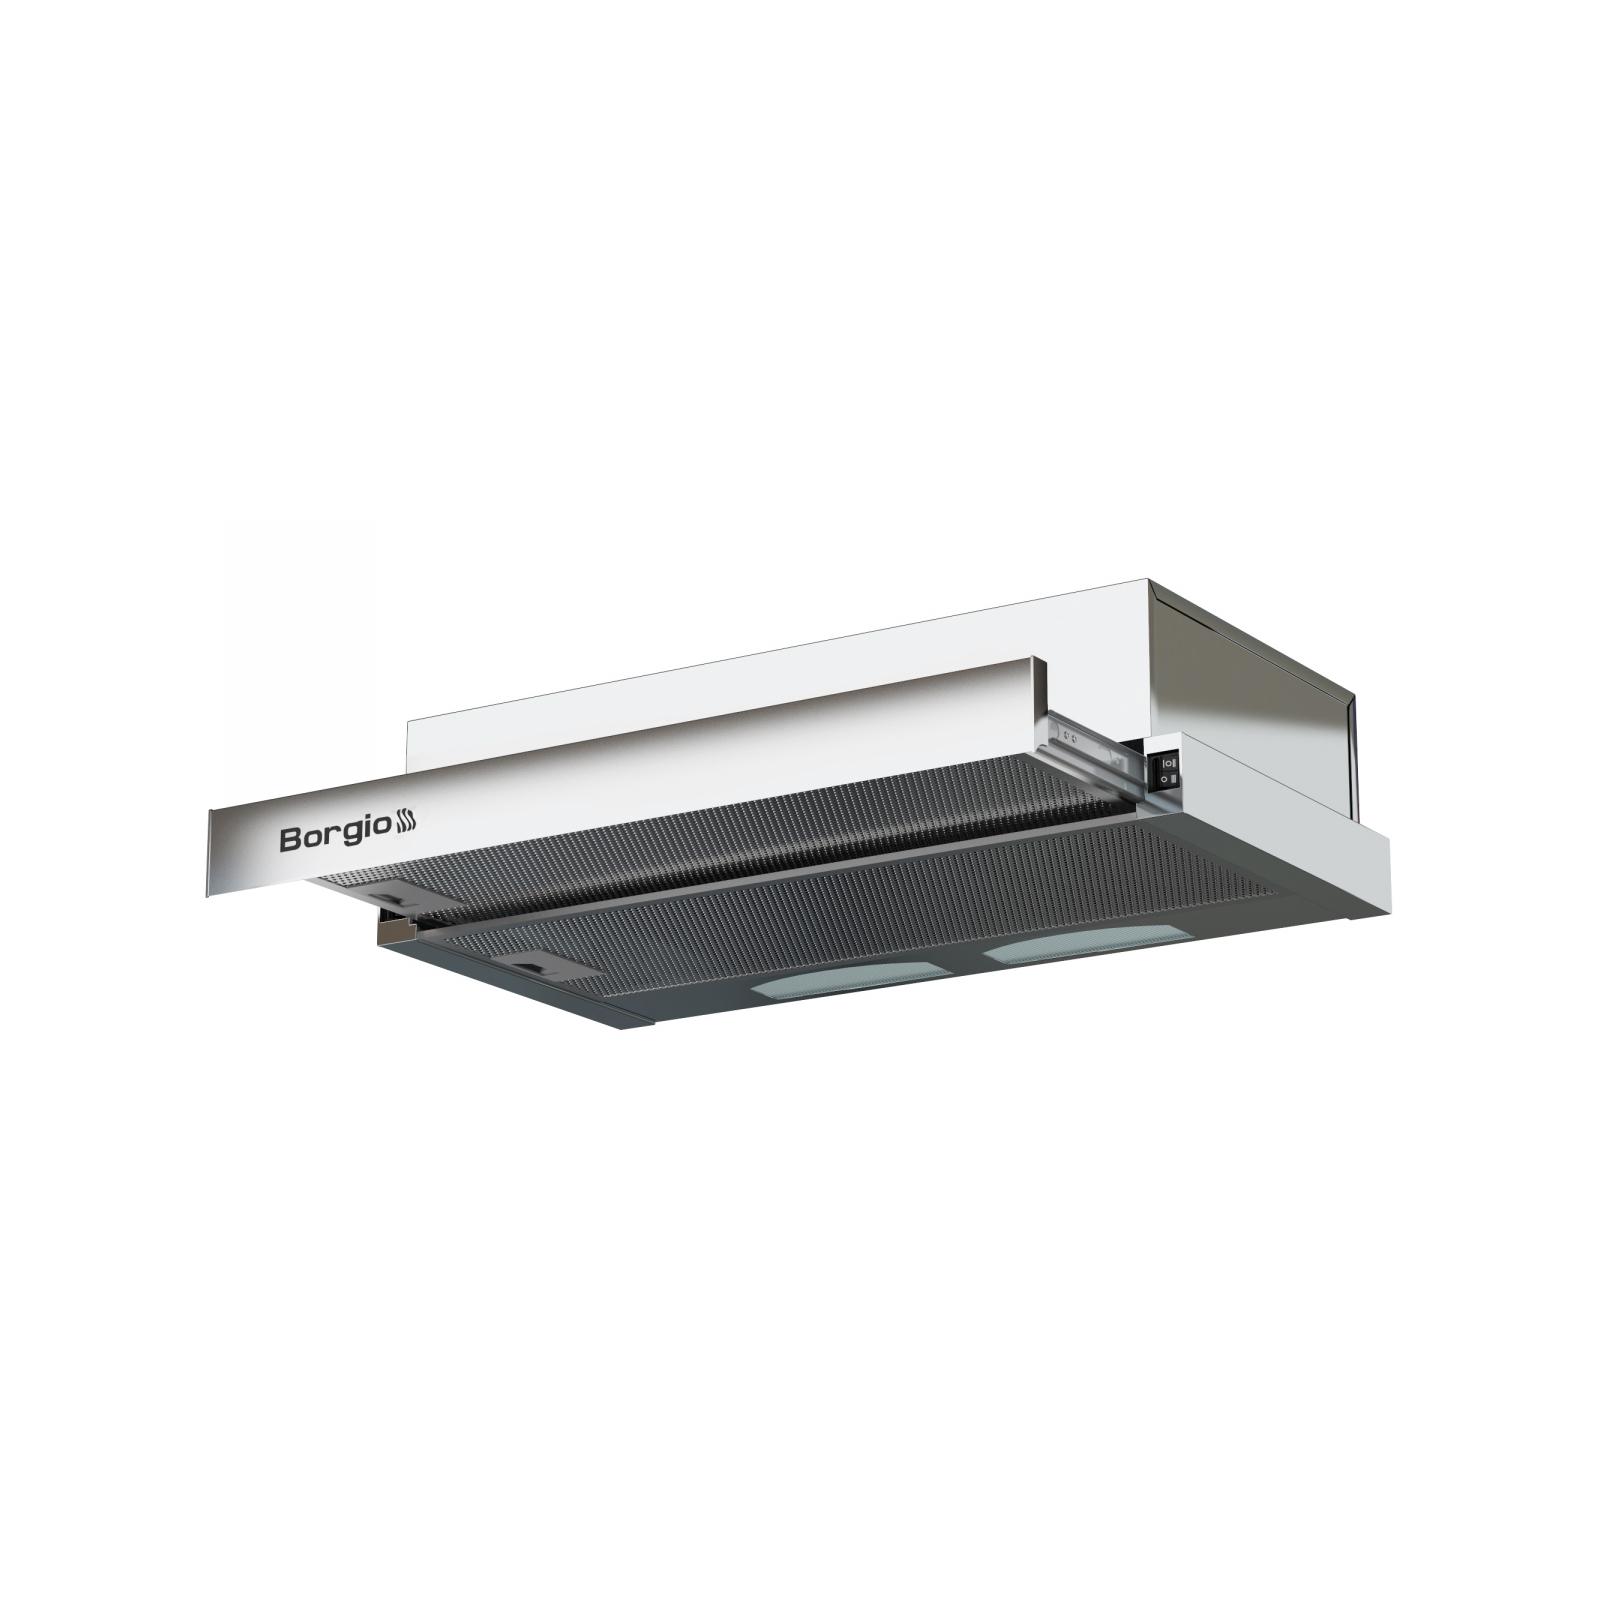 Вытяжка кухонная Borgio SLIM(R) 60 inox